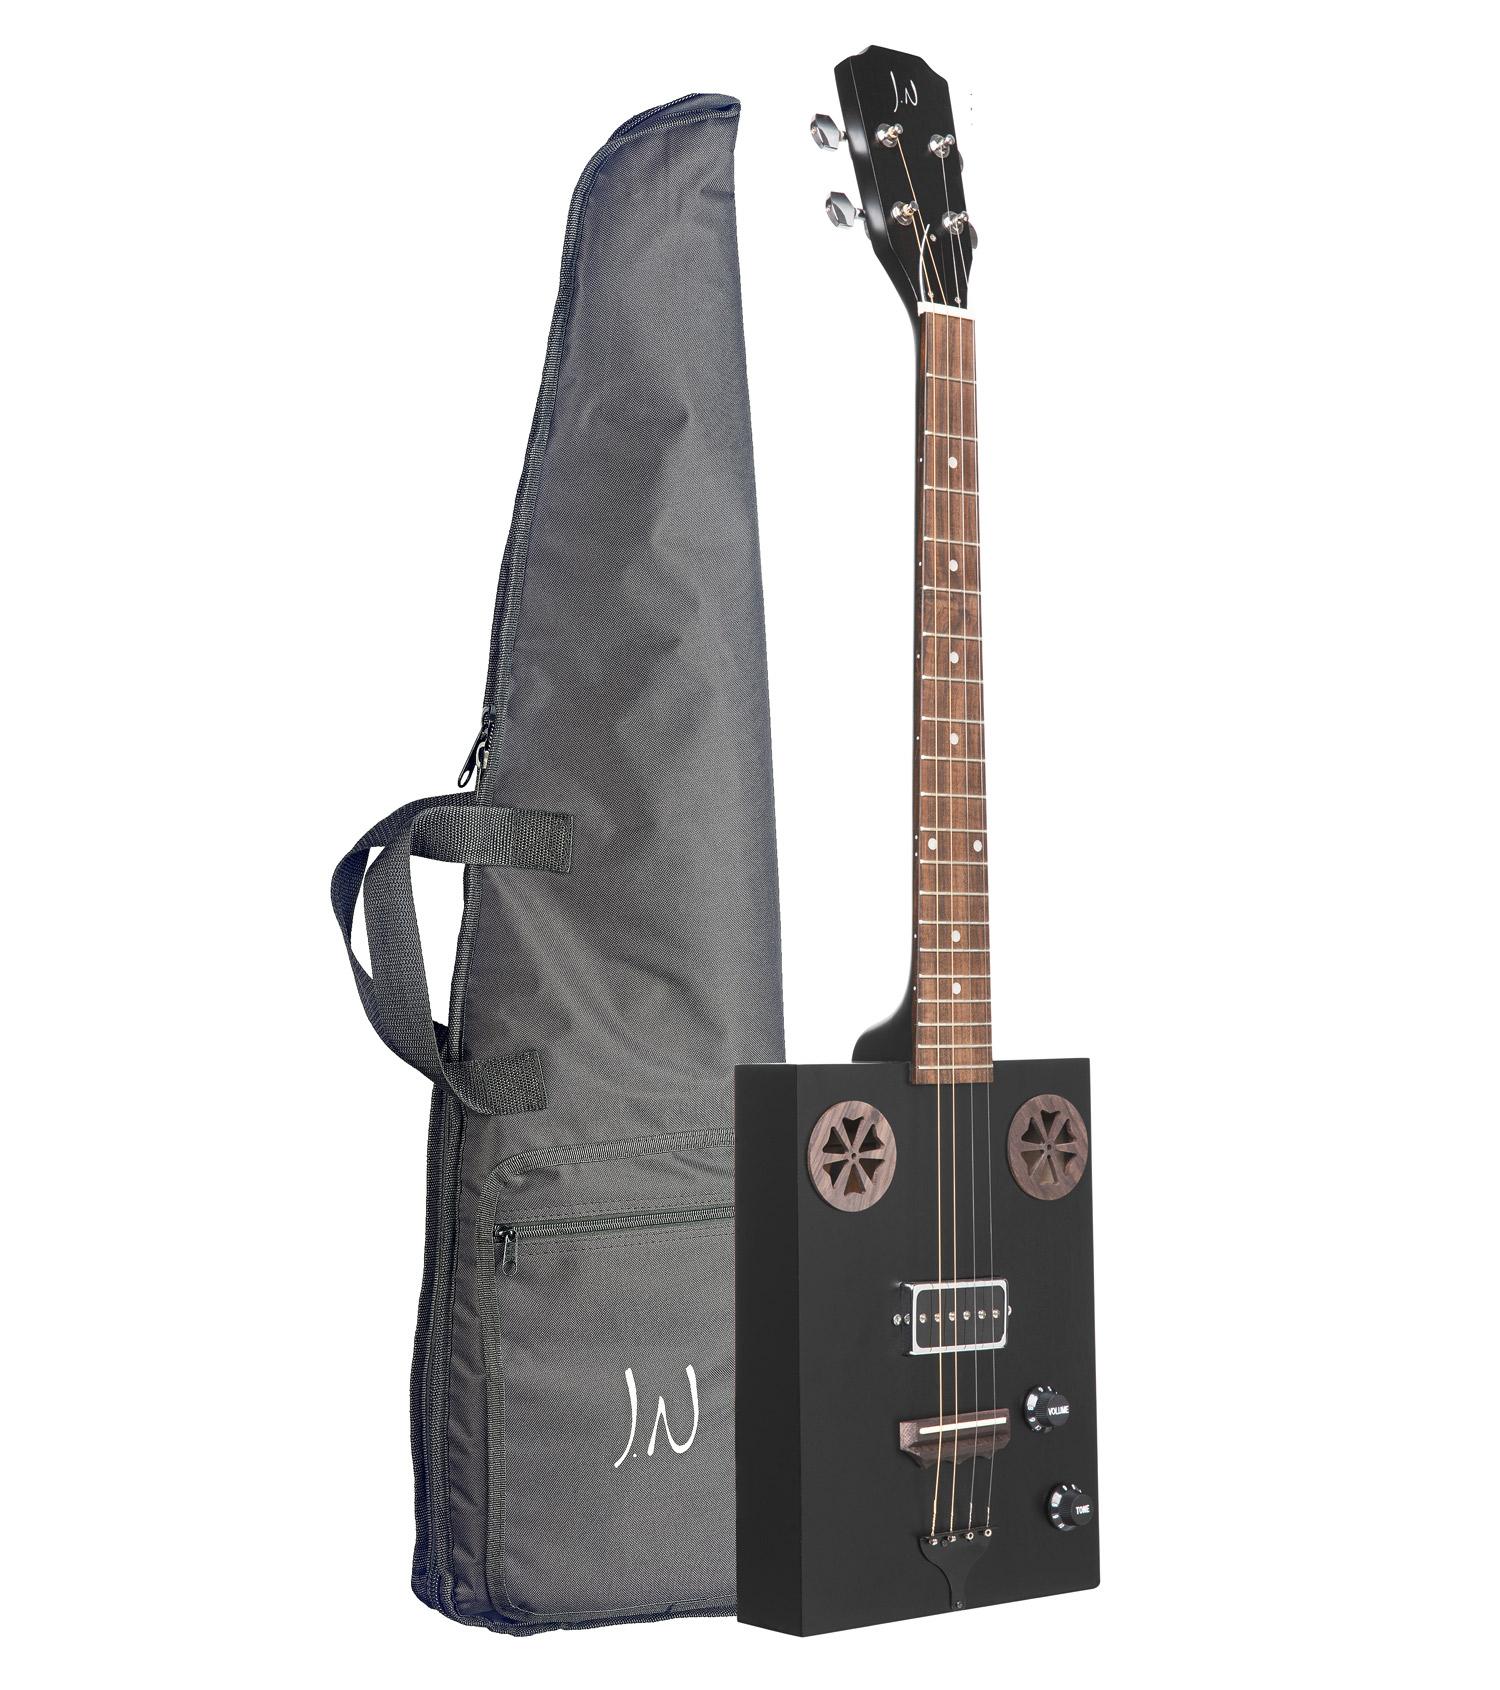 JN Guitars Cask Hogscoal Cigarbox m/bag